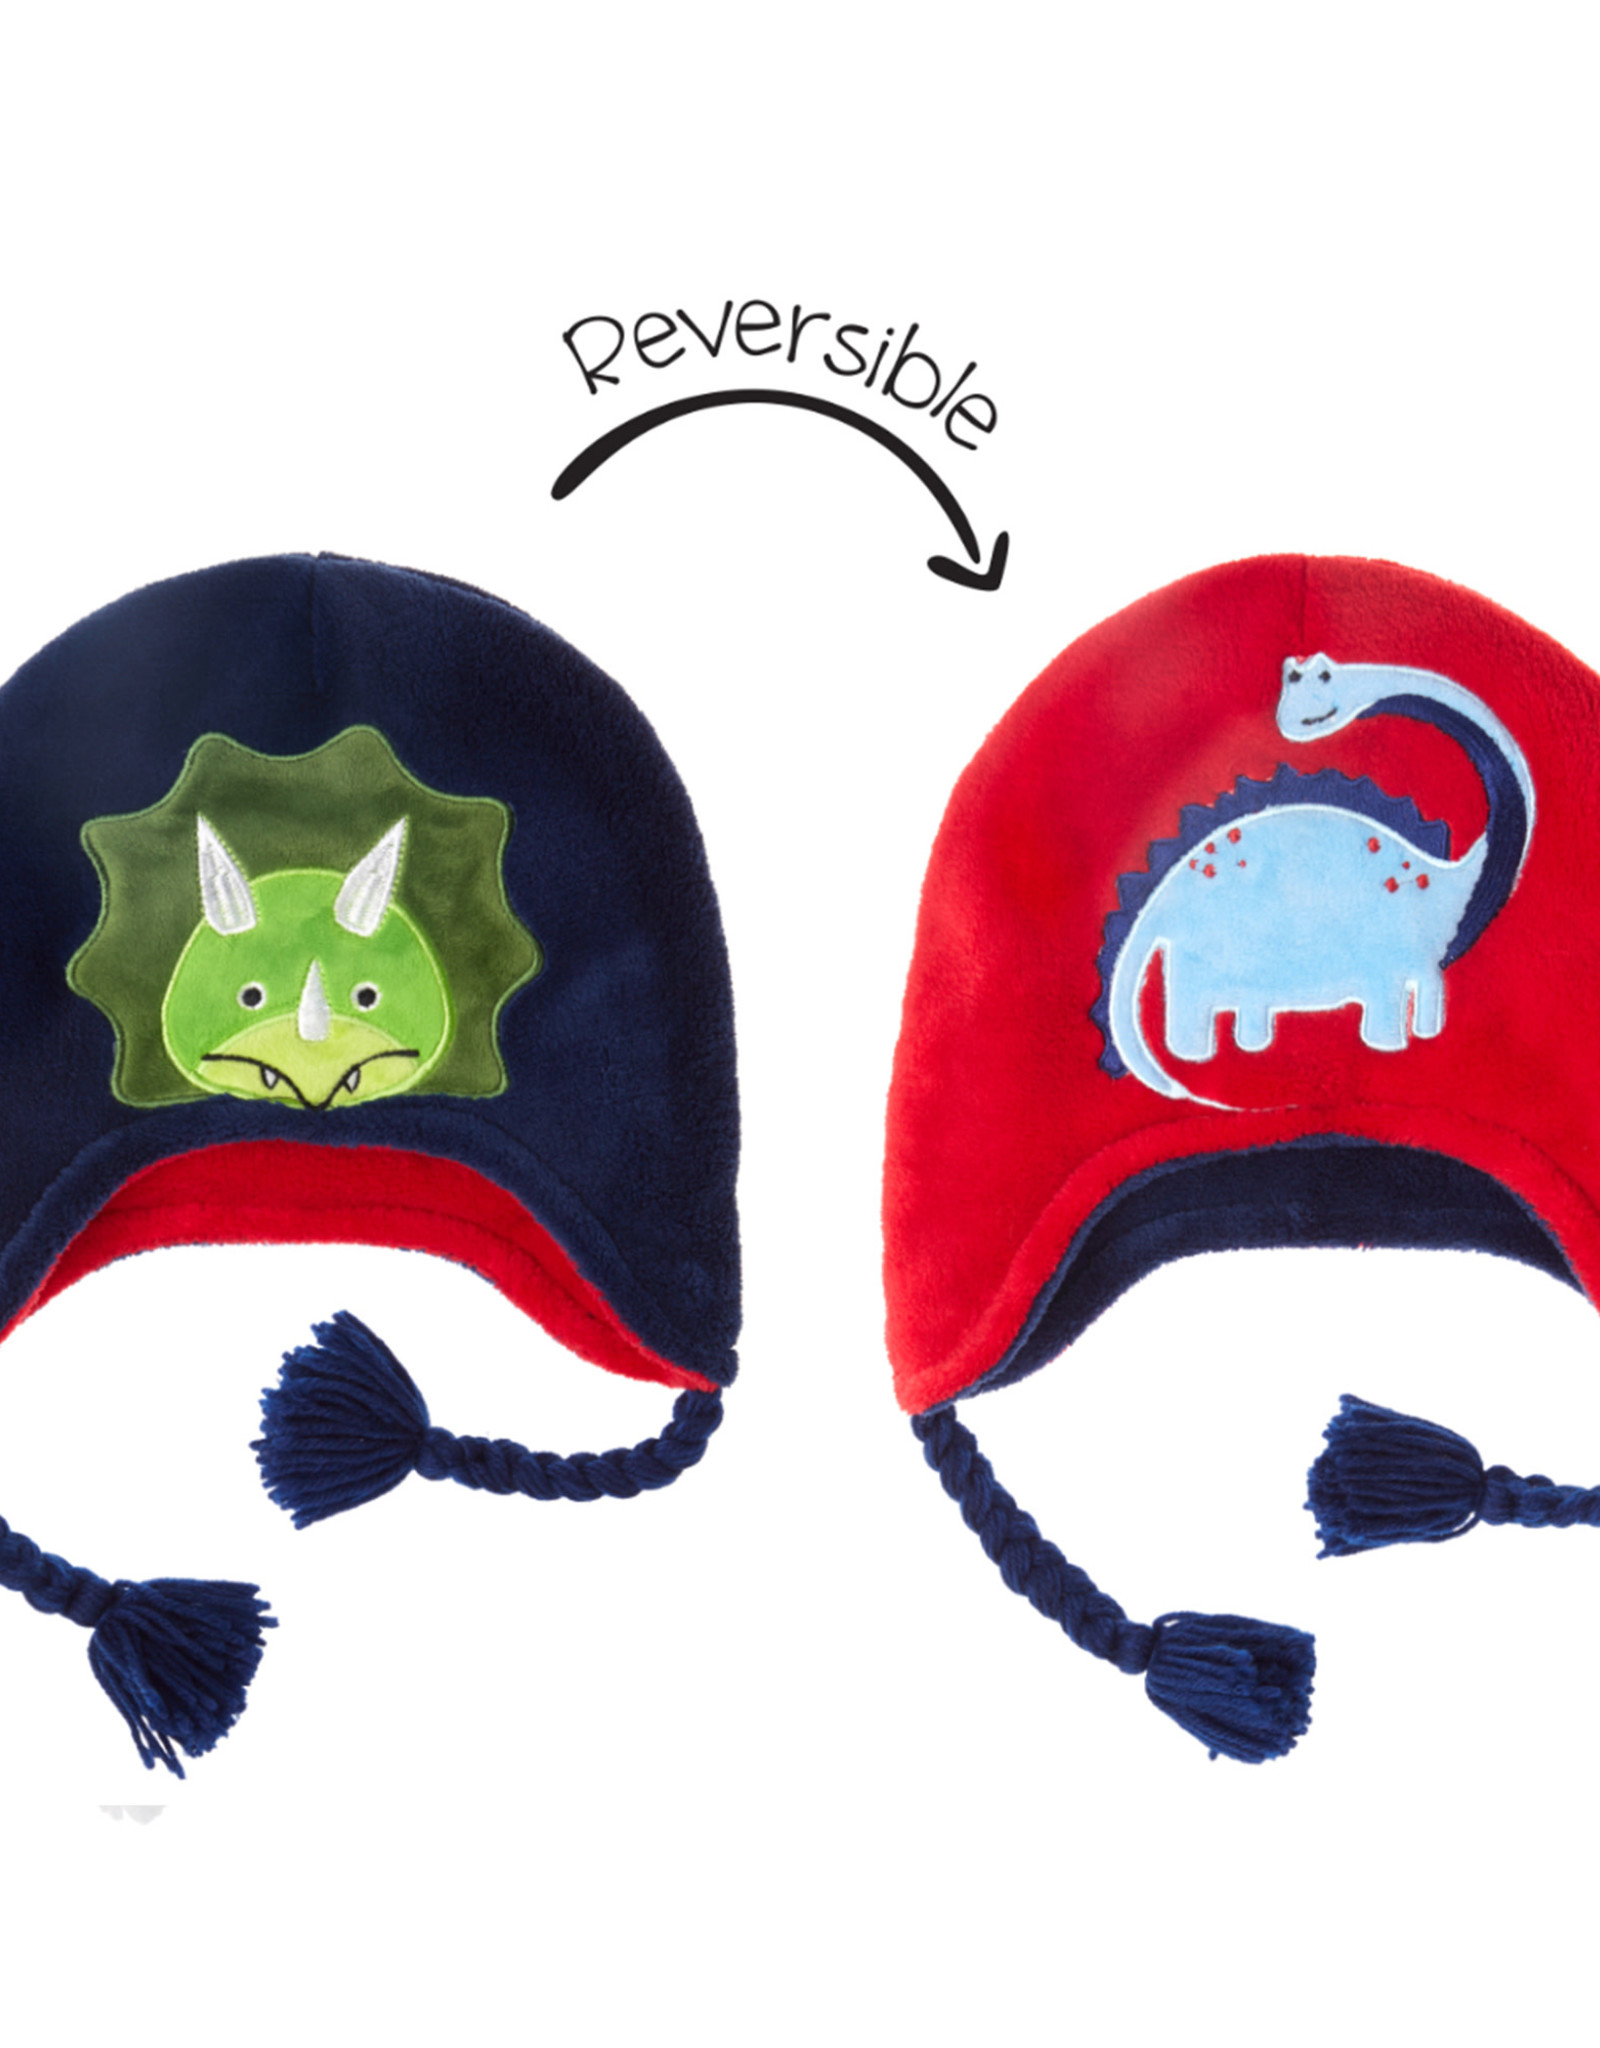 FlapJackKids FlapJackKids Reversible Fleece Hat - Dinosaur - Youth 3-8